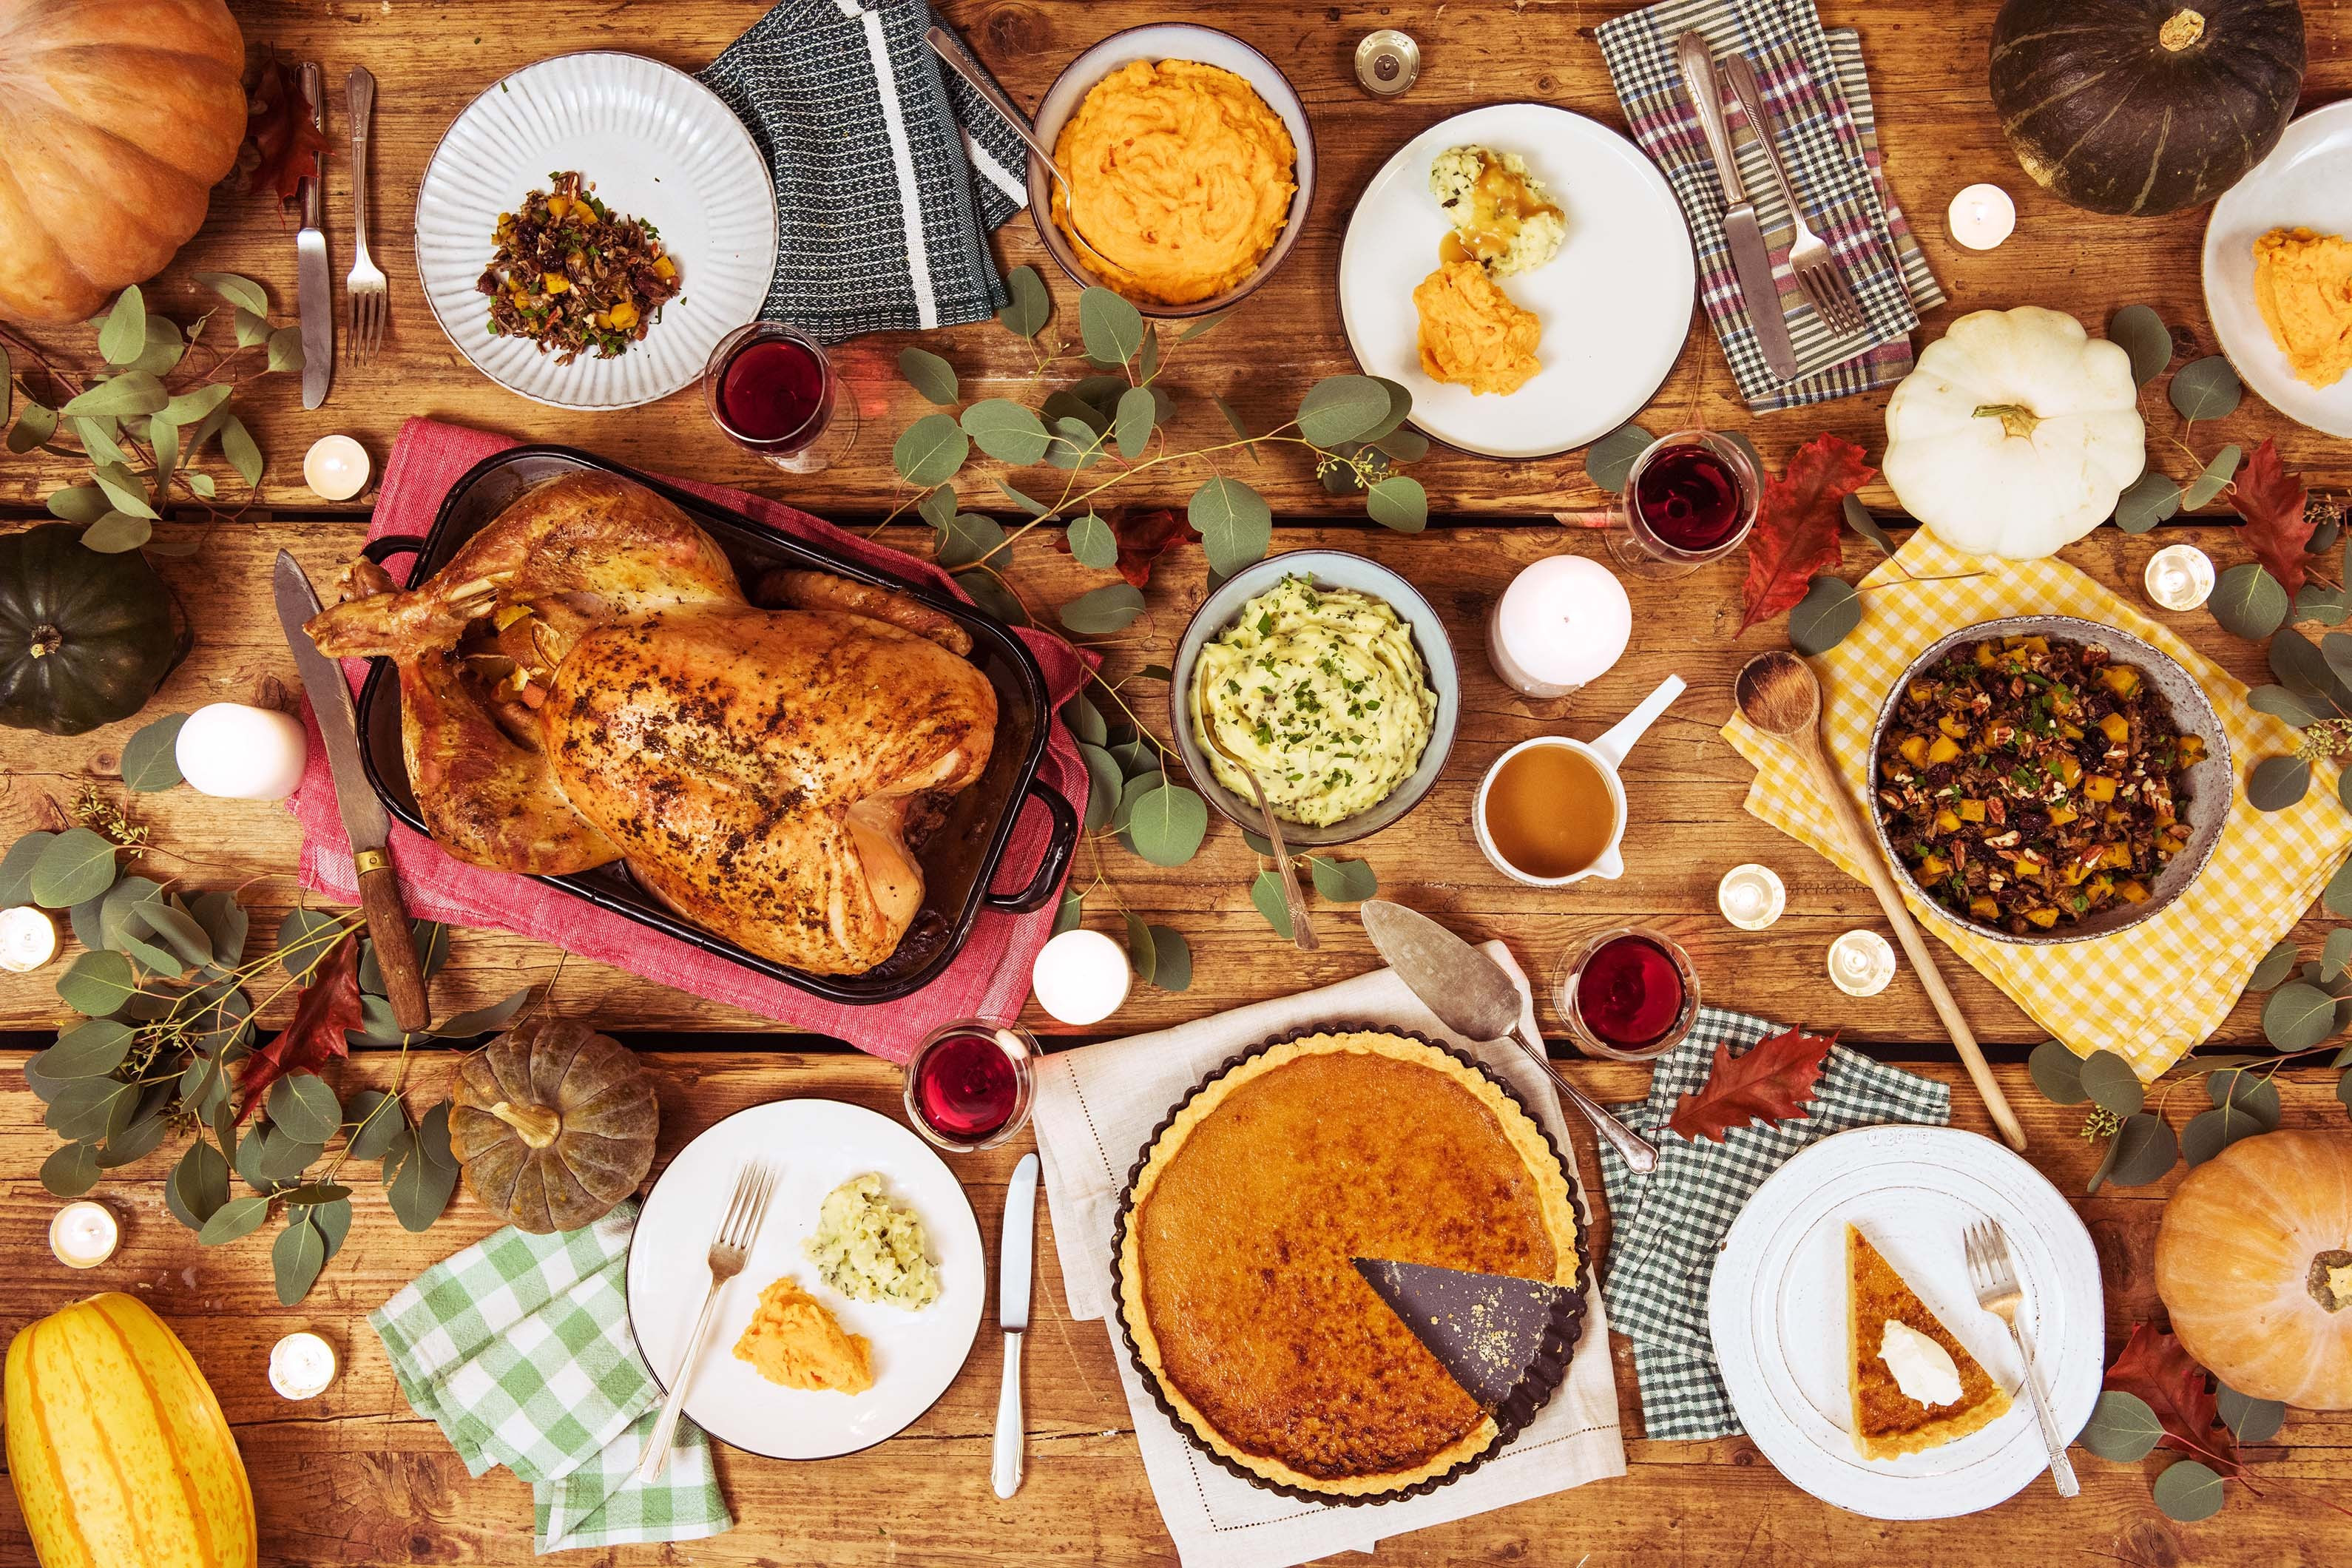 Thanksgiving Dinner Ideas  Deliciously Simple Thanksgiving Menu Ideas